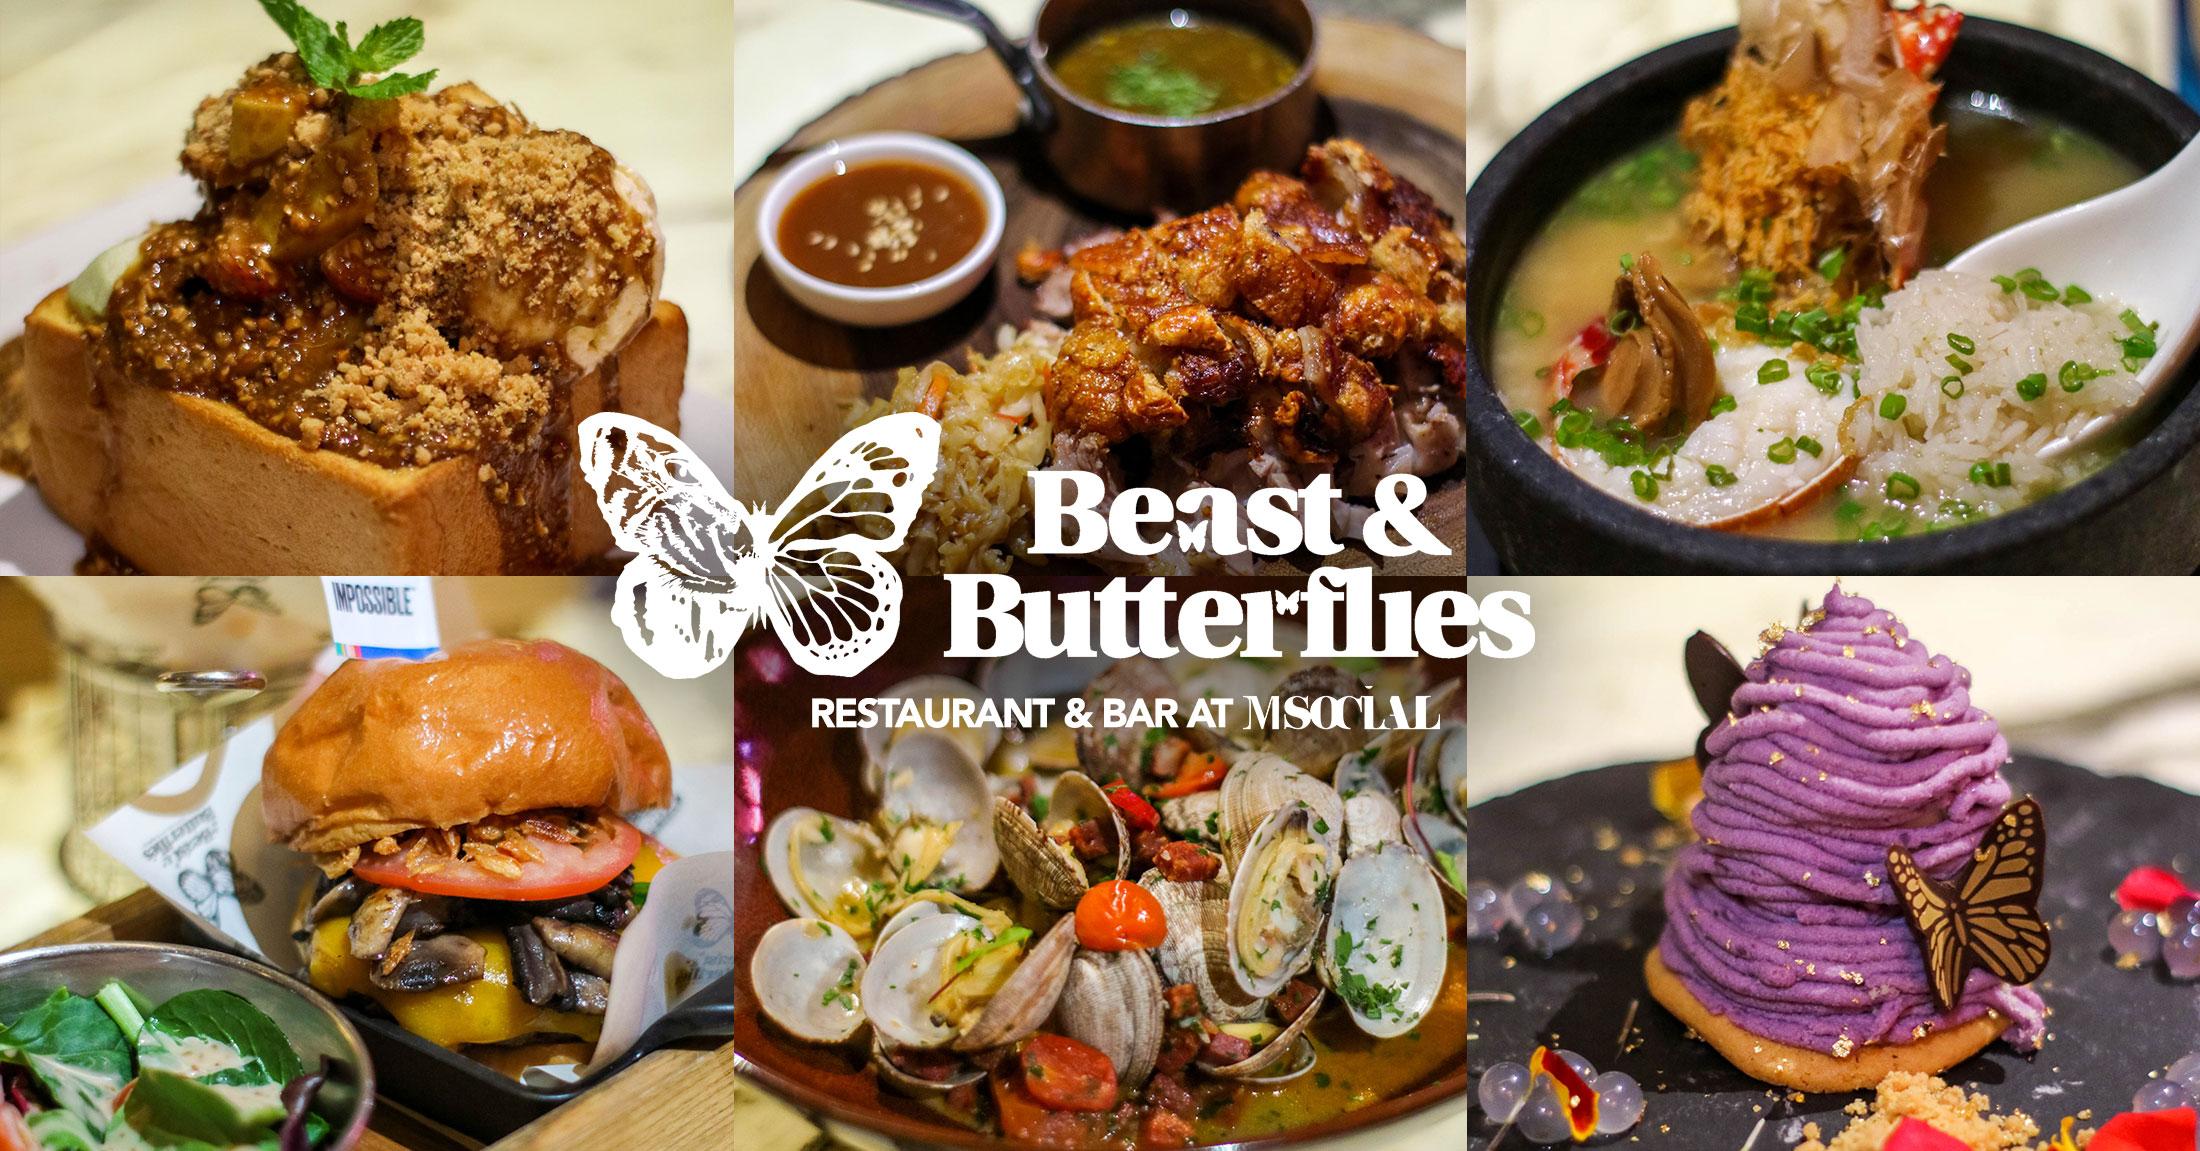 beast-and-butterflies-msocial-darrenbloggie-featured